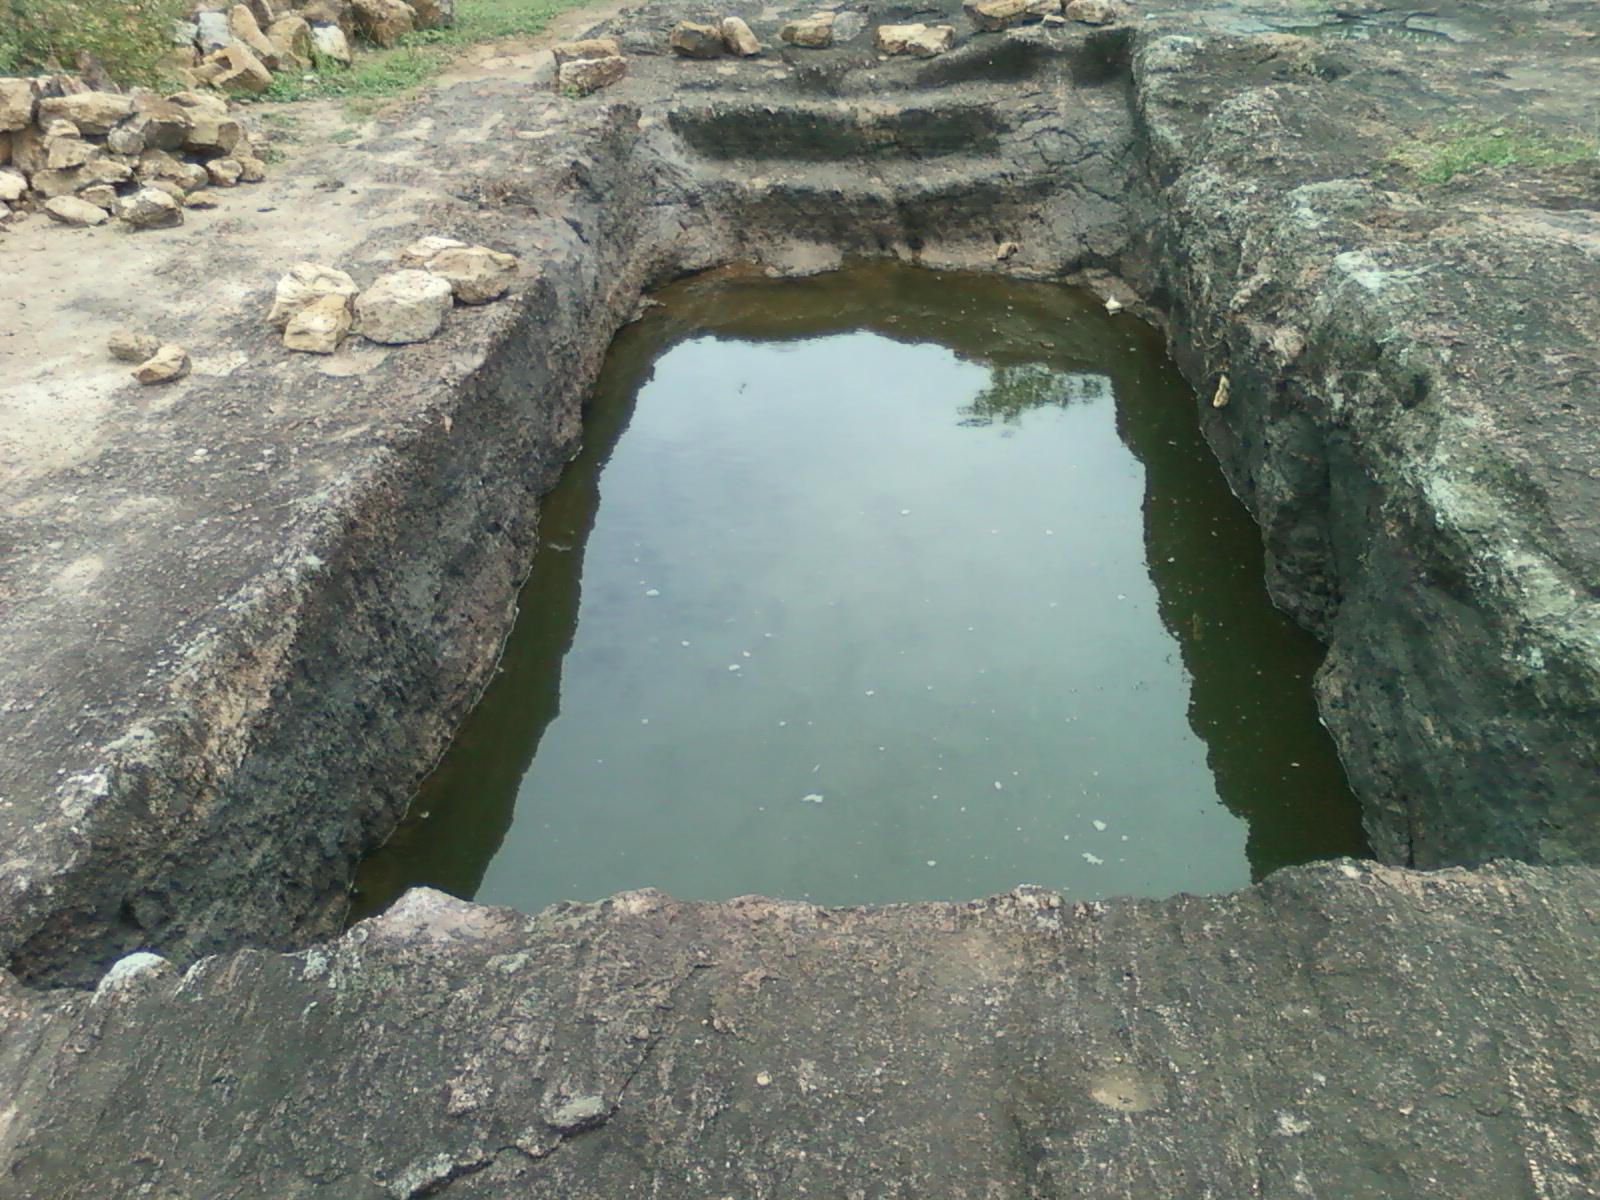 one_of_the_16_rockcut_cisterns_at_pavurallakonda_bheemili